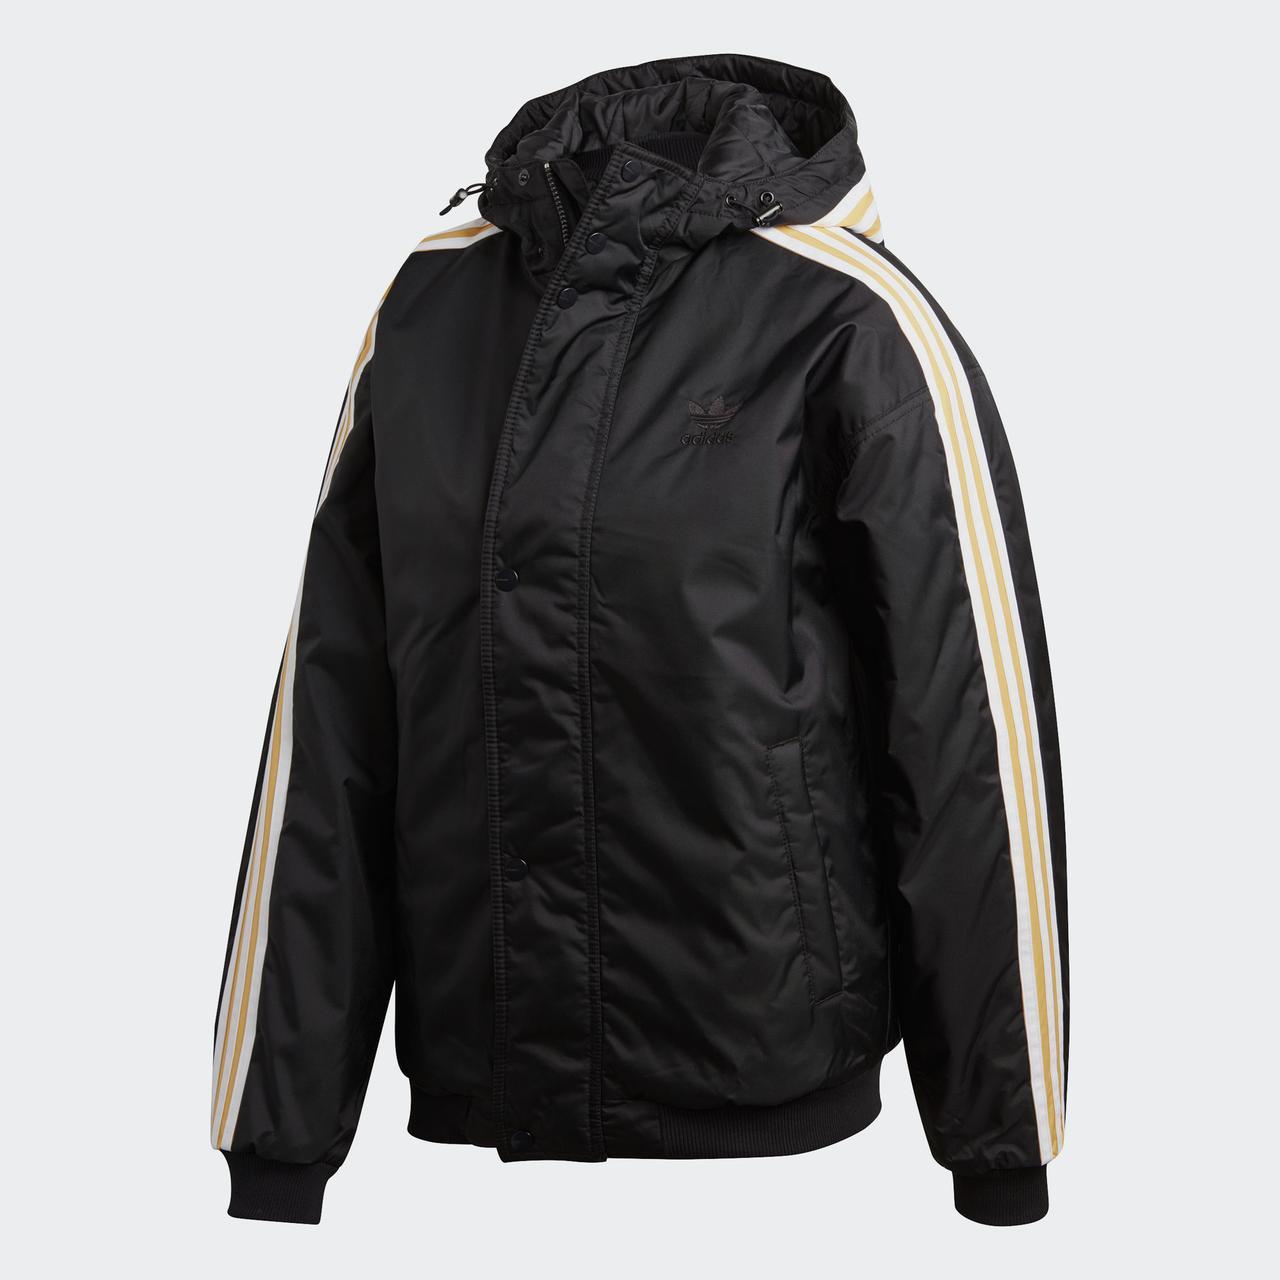 4766ae906237 Купить Женская куртка Adidas Originals SST Stadion (Артикул  DH4565 ...